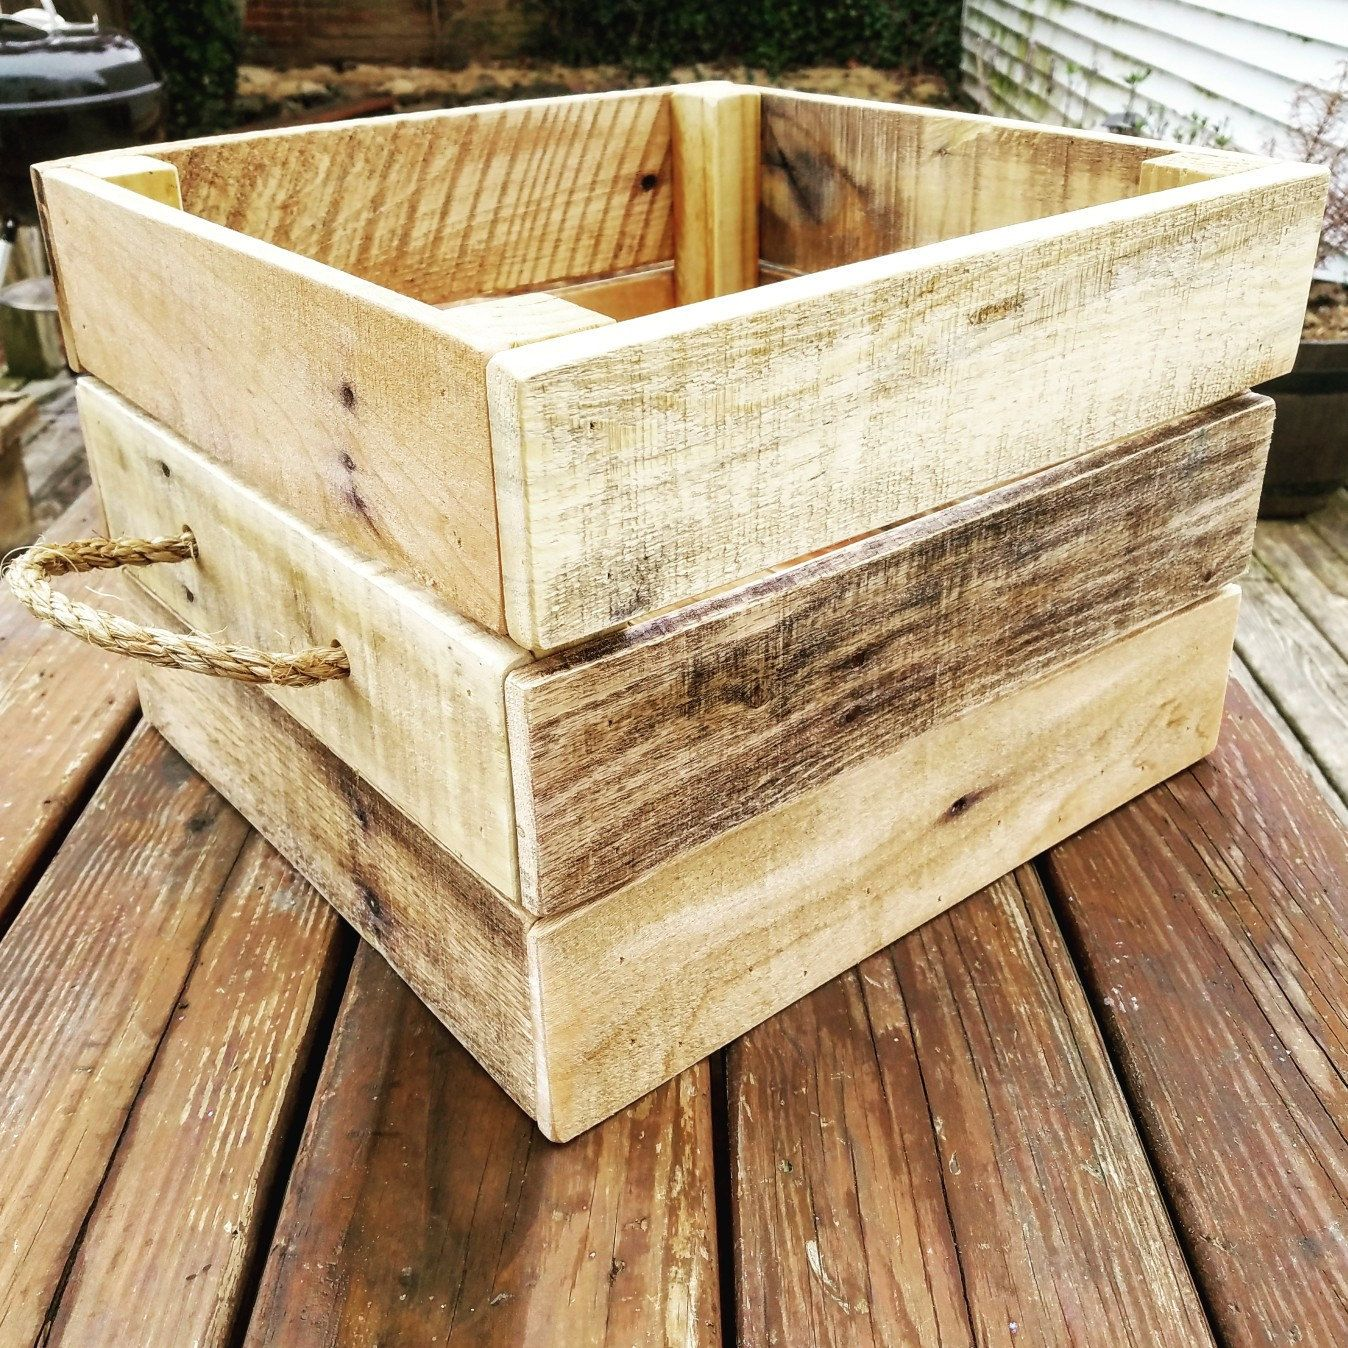 Rustic Wooden Pallet Bin Toy Box Dog Toy Crate Storage Basket